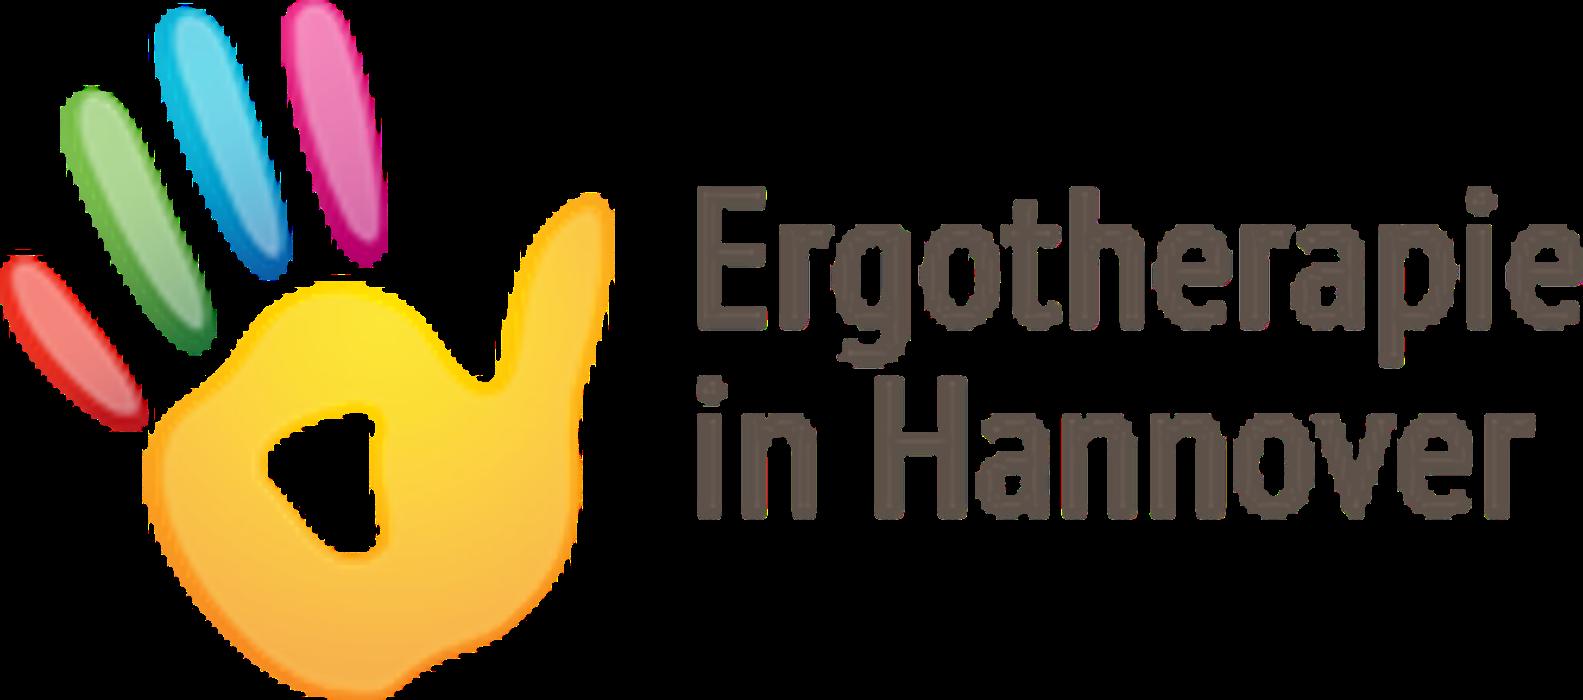 Ergotherapie in Hannover GbR